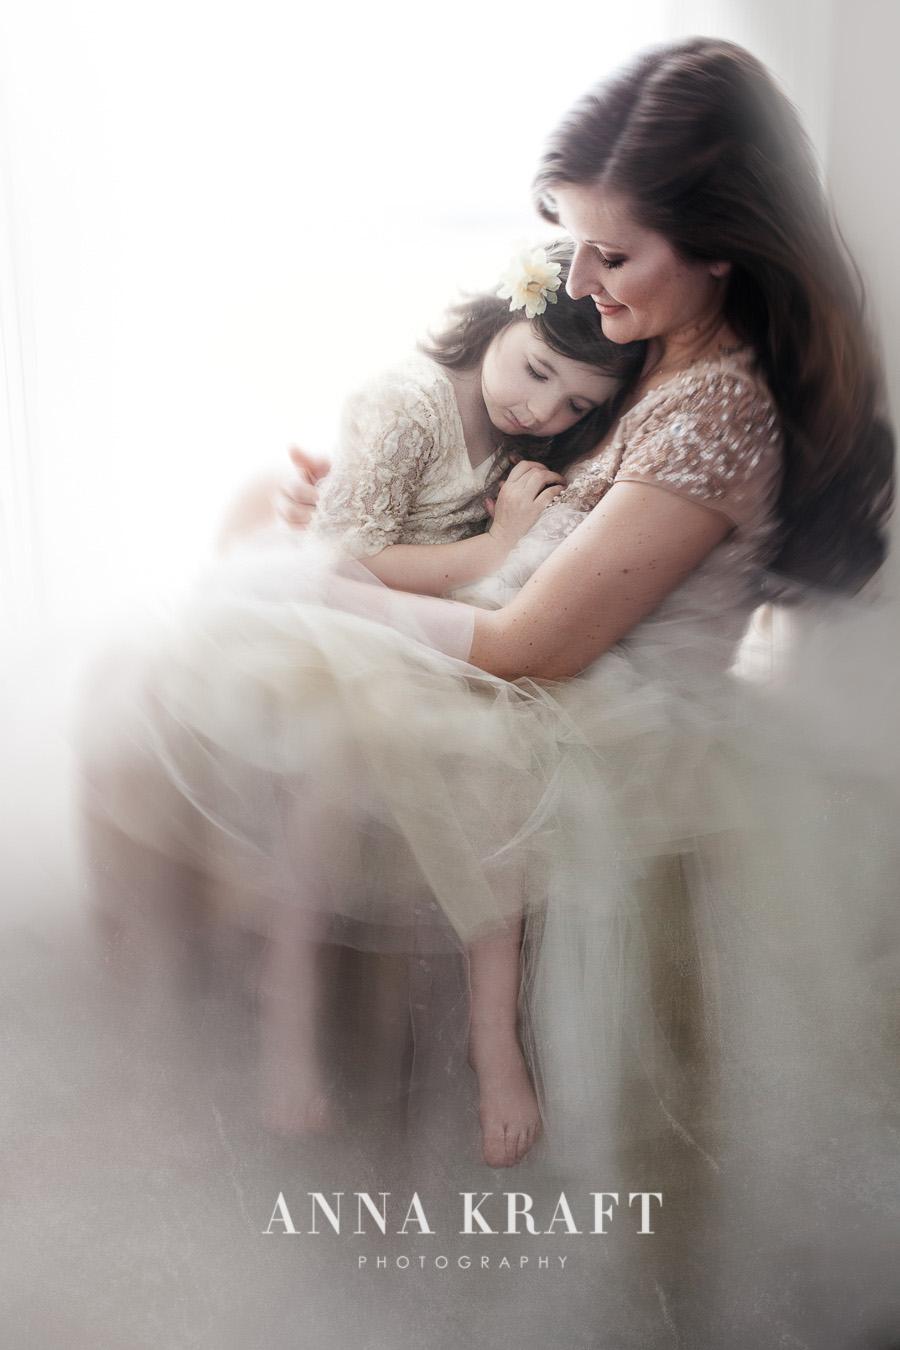 anna_kraft_photography_mother_daughter_georgetown_custom_boutique_portrait-11.JPG